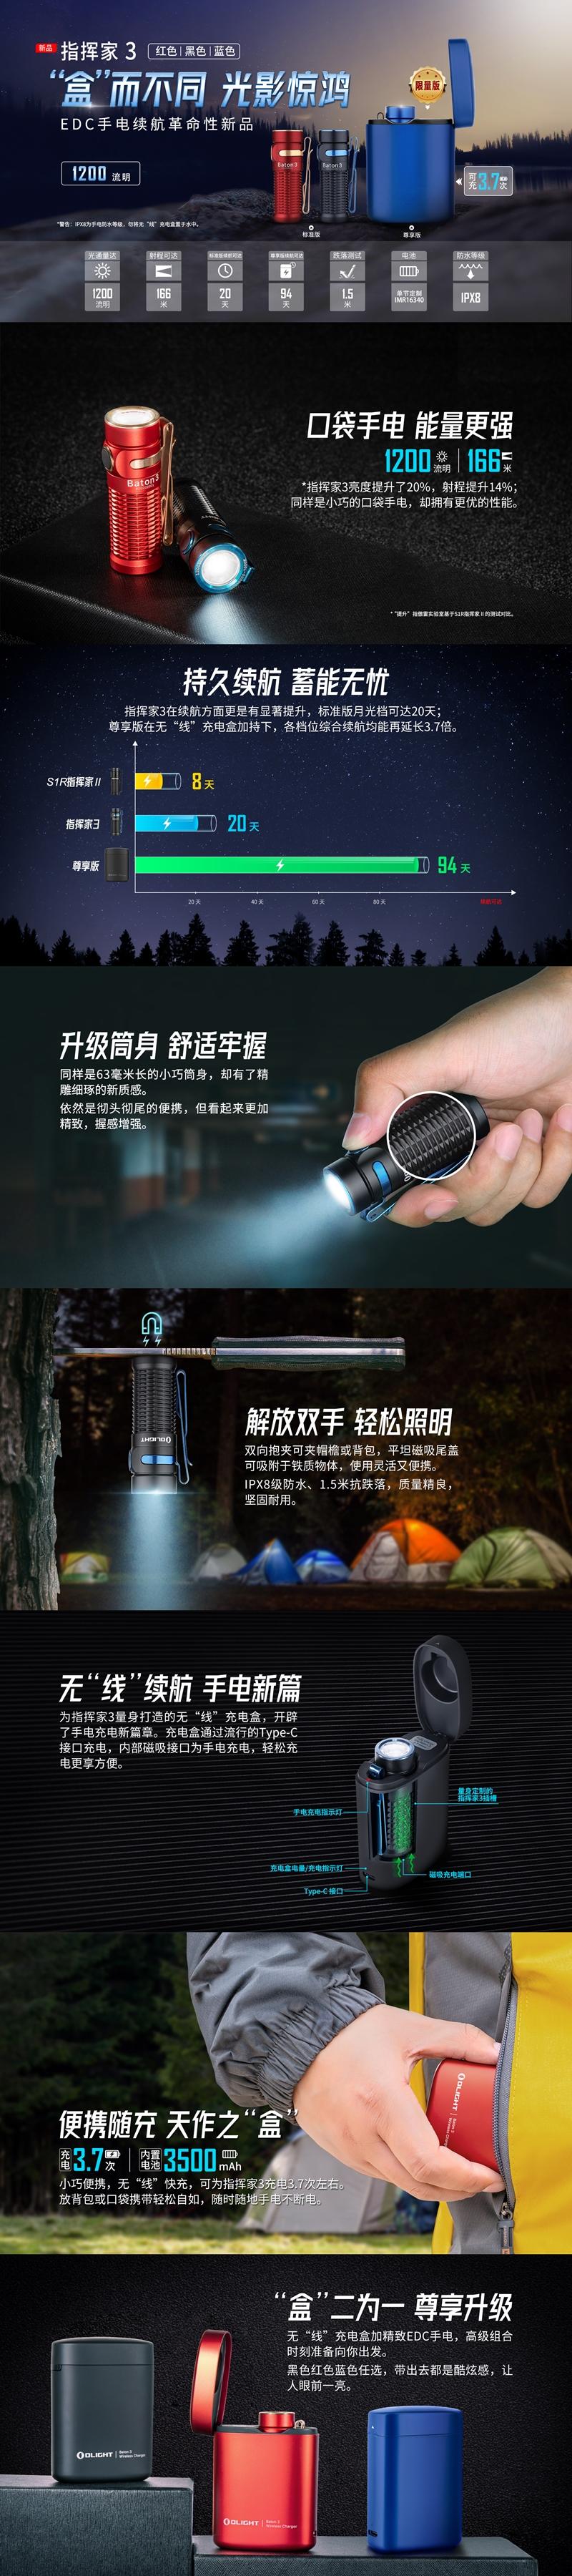 Olight Baton 3 指揮家3Premium Edition  1,200 lumens powerful Baton 3 and portable wireless charger (1)